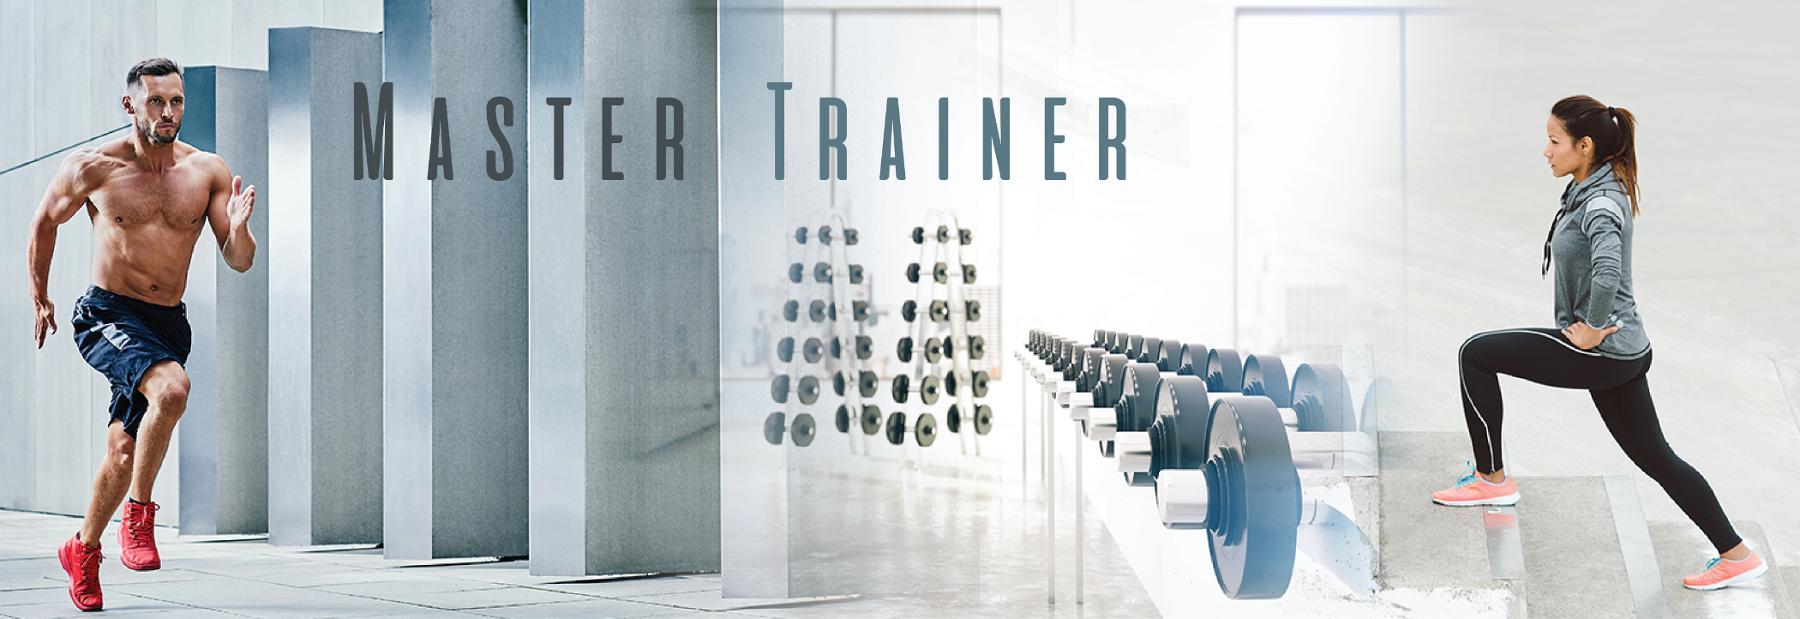 Nccpt Master Trainer Program